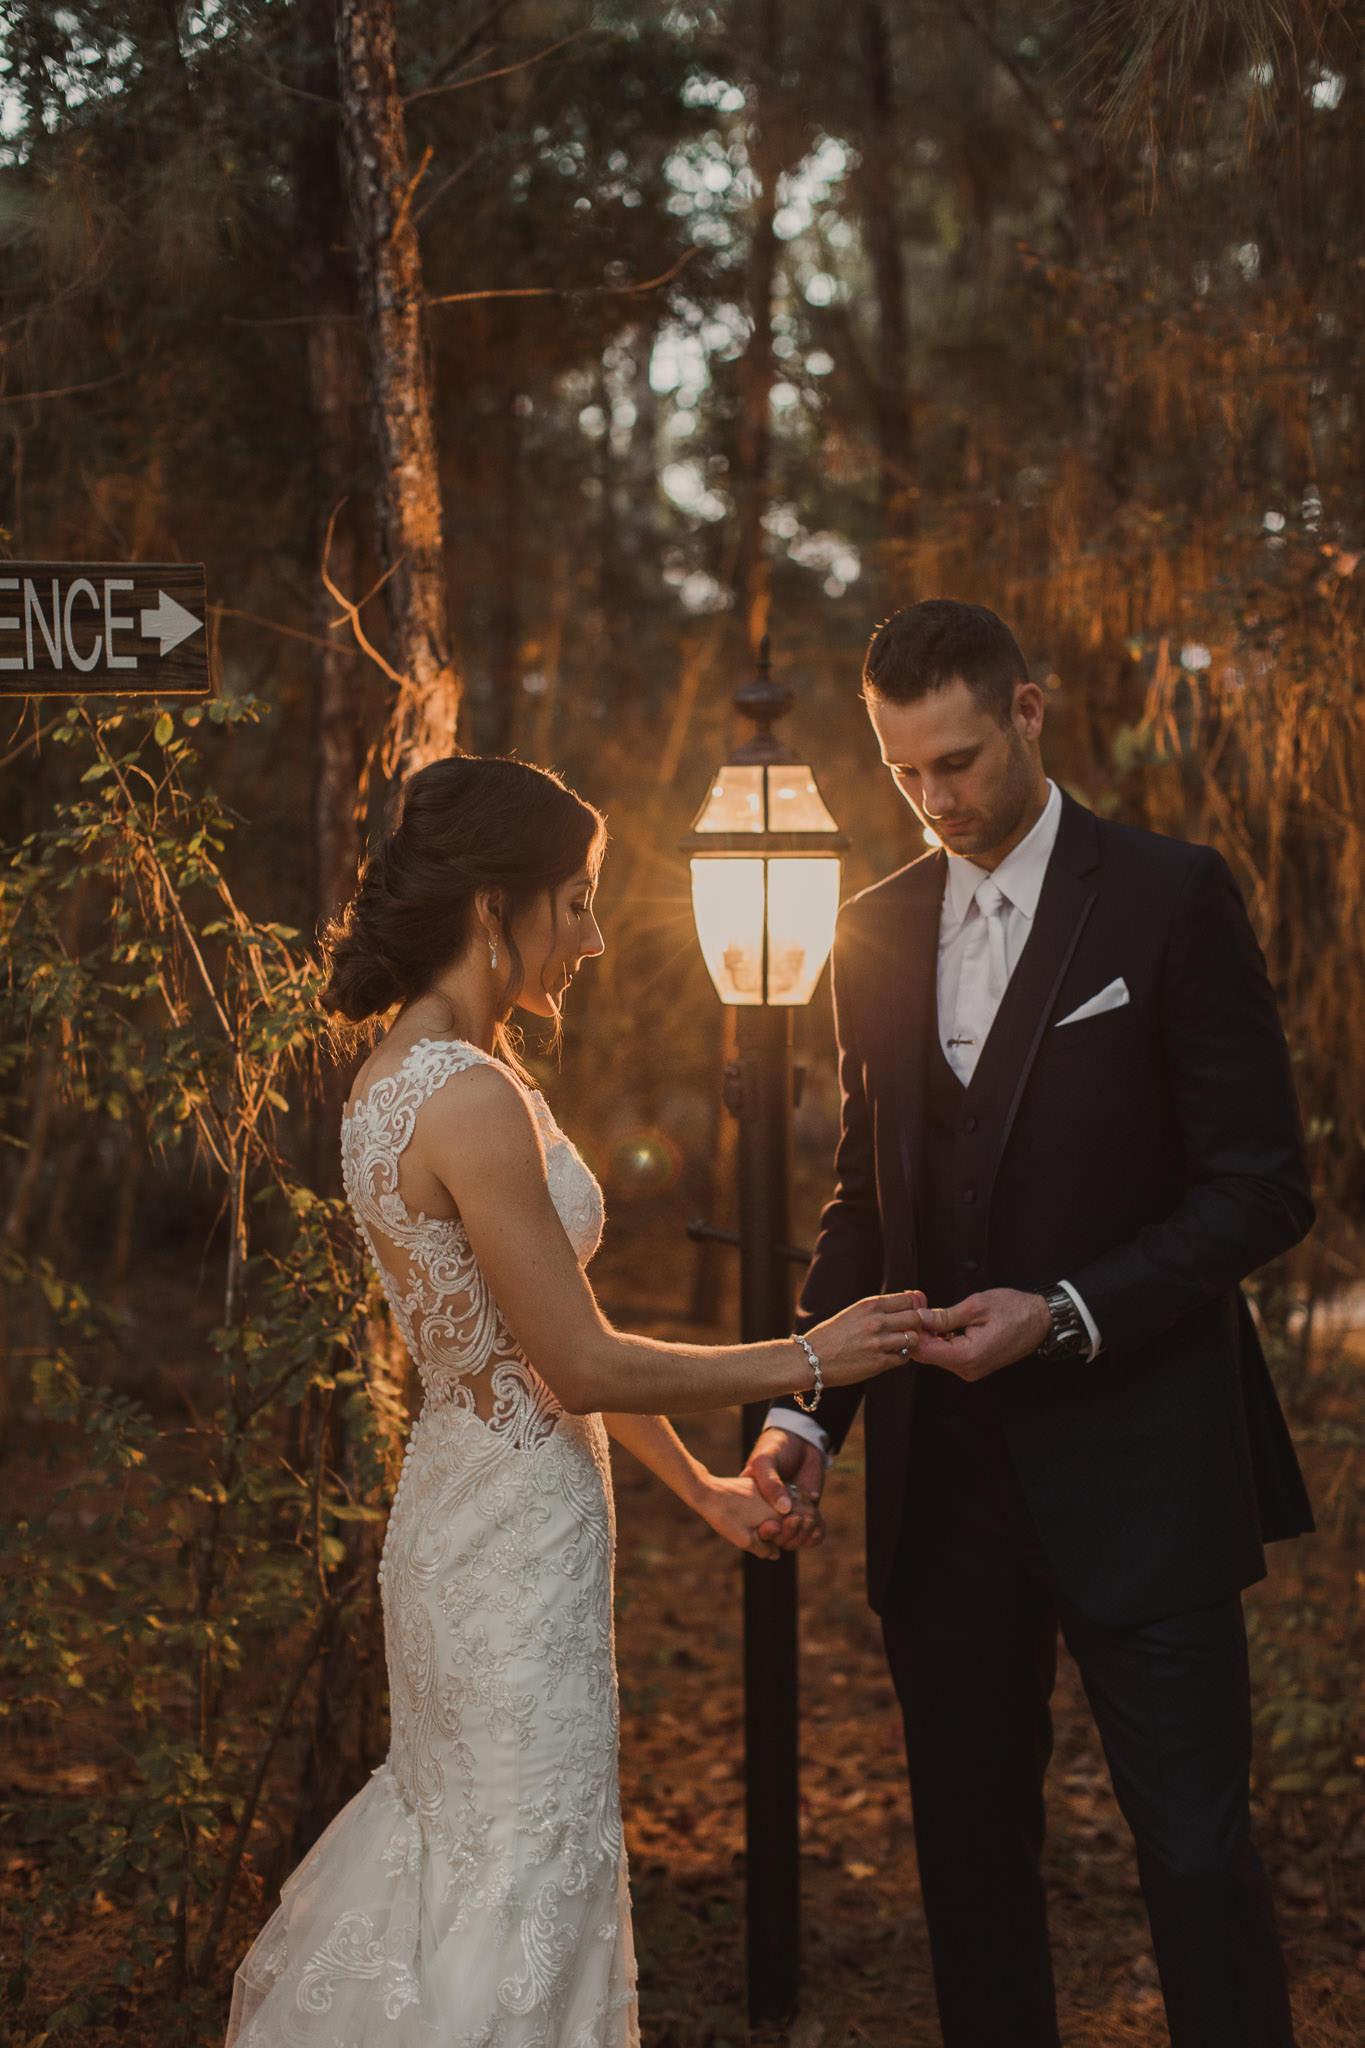 nichole-kyle-magnolia-bells-magnolia-wedding-sm-133.jpg